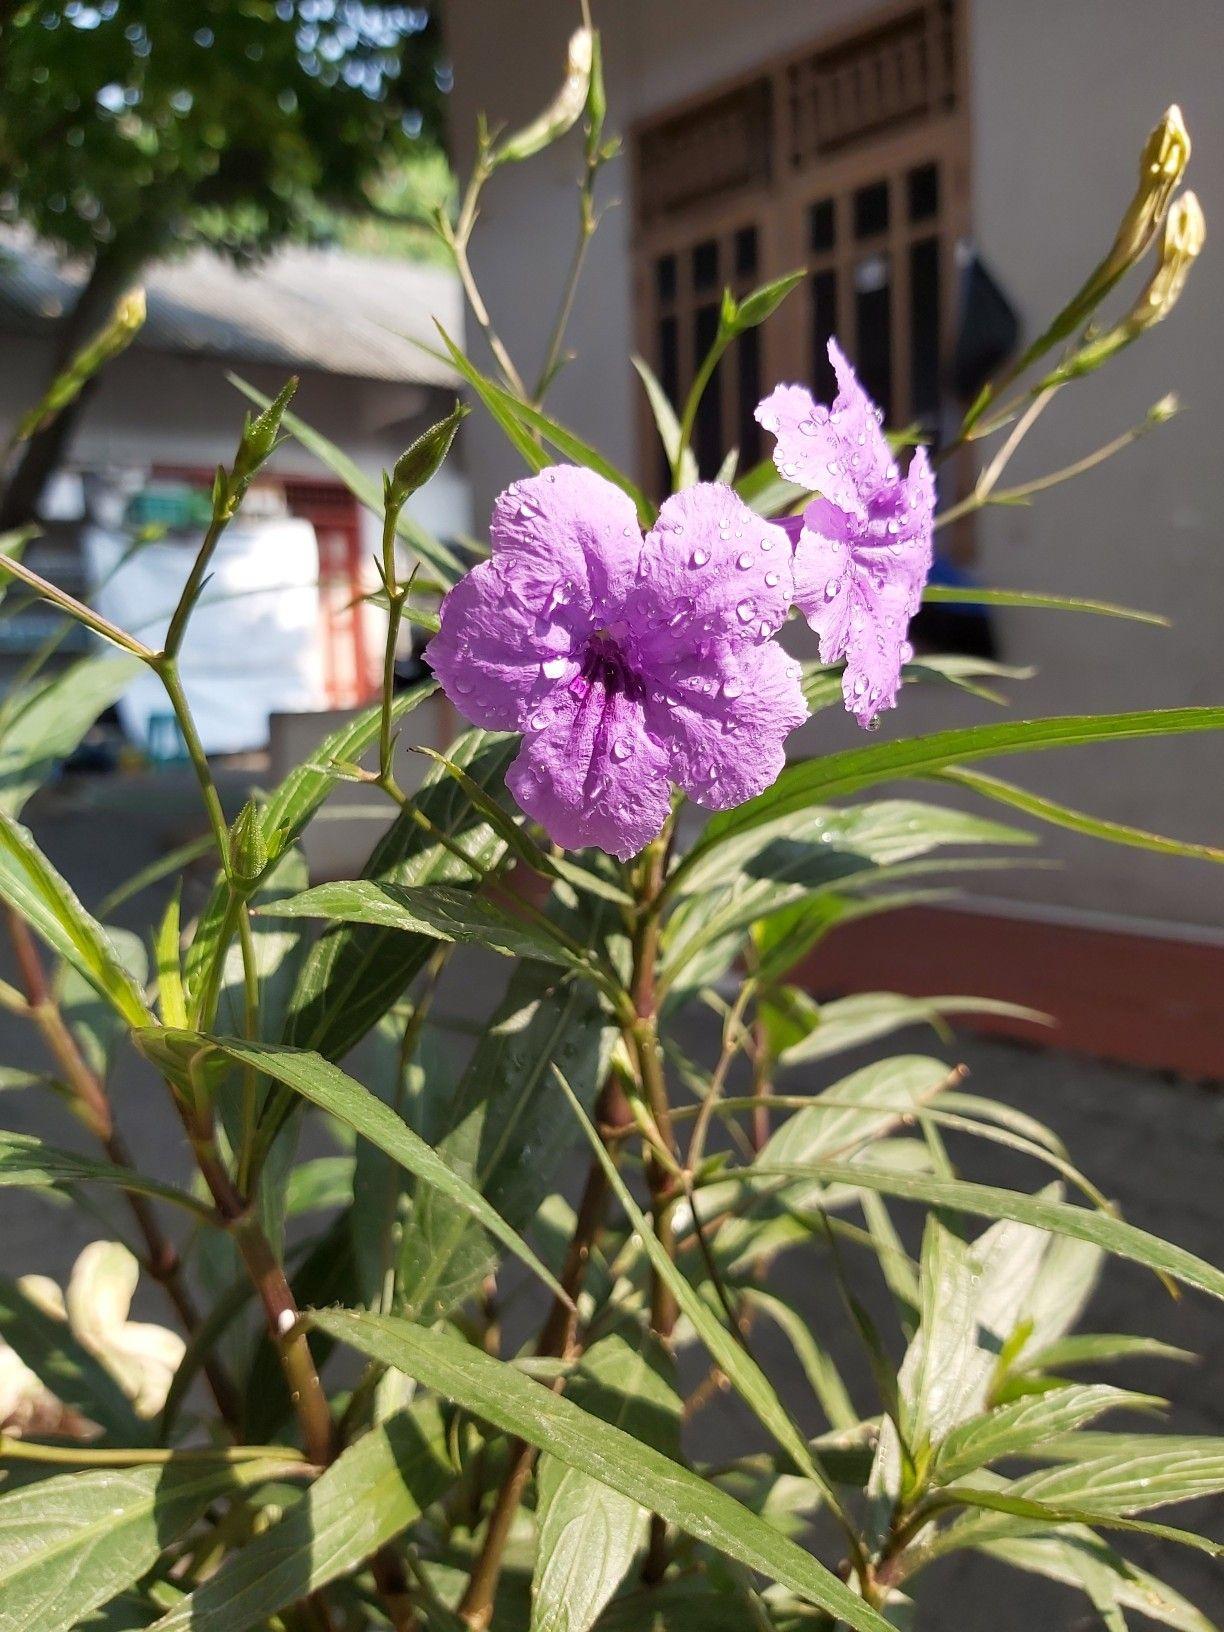 Kencana Ungu Bunga Liar Bunga Tanaman